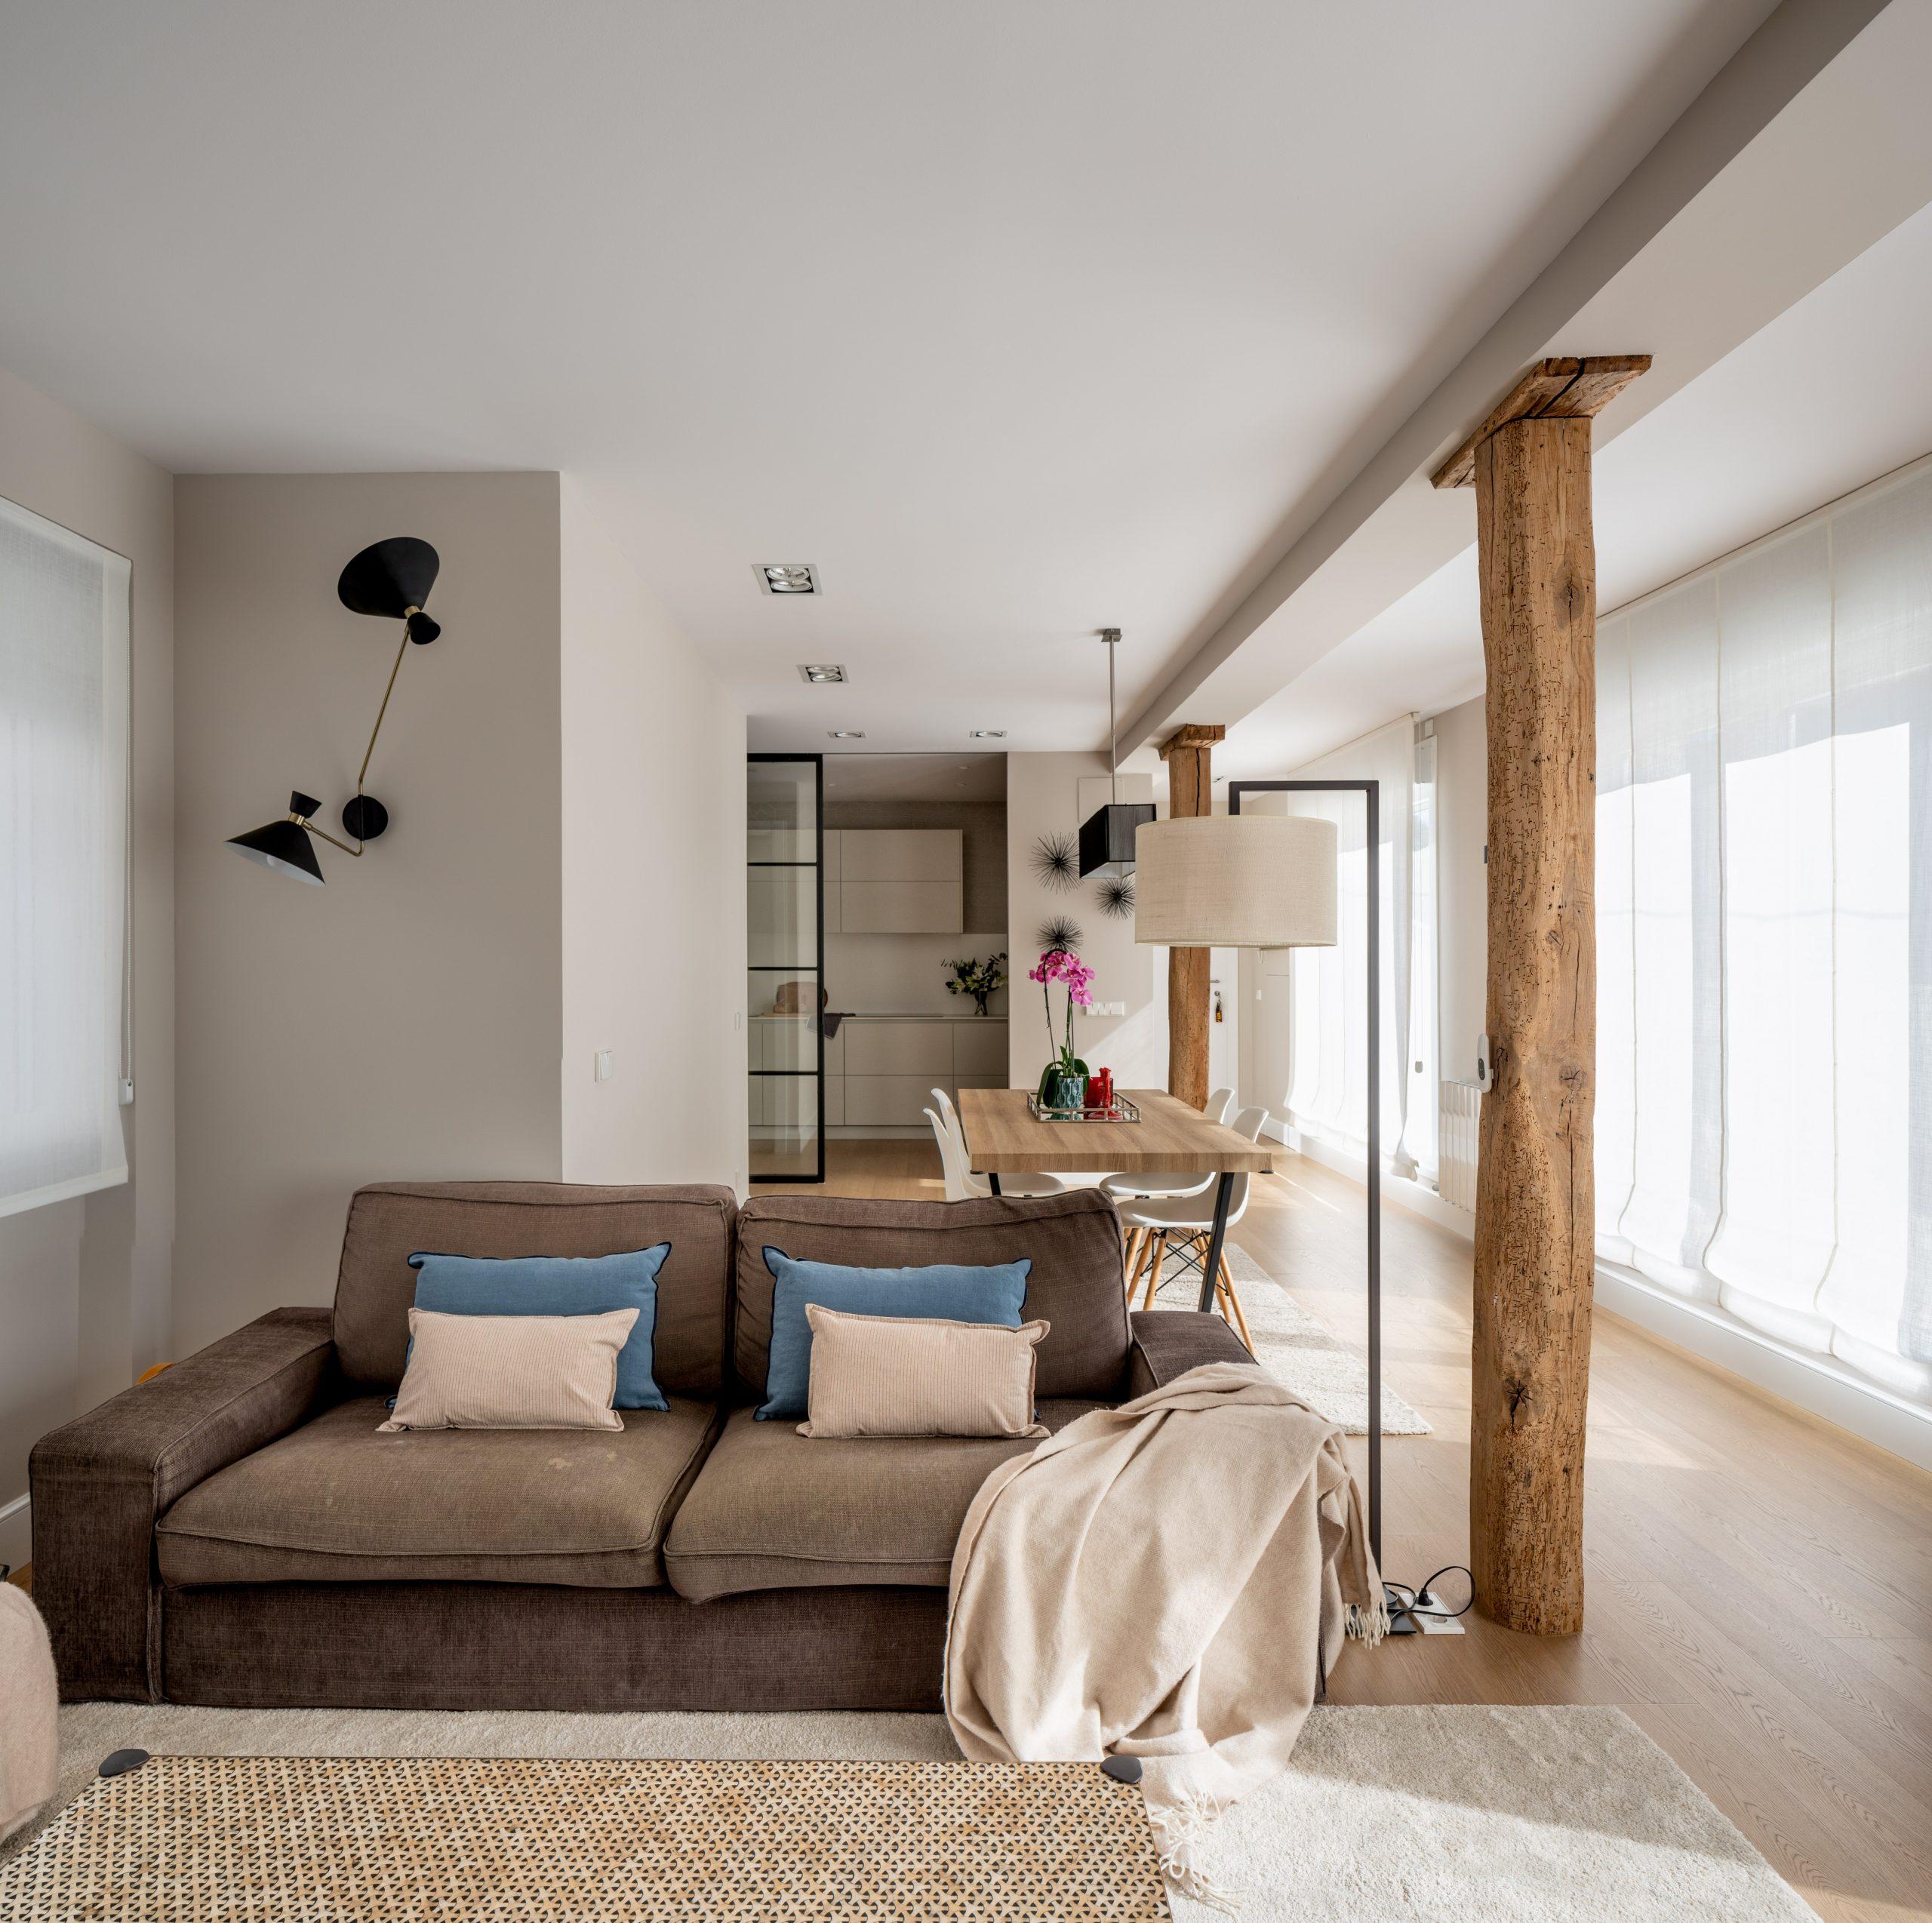 Fotógrafo de arquitectura en Bilbao - Imagen de salón